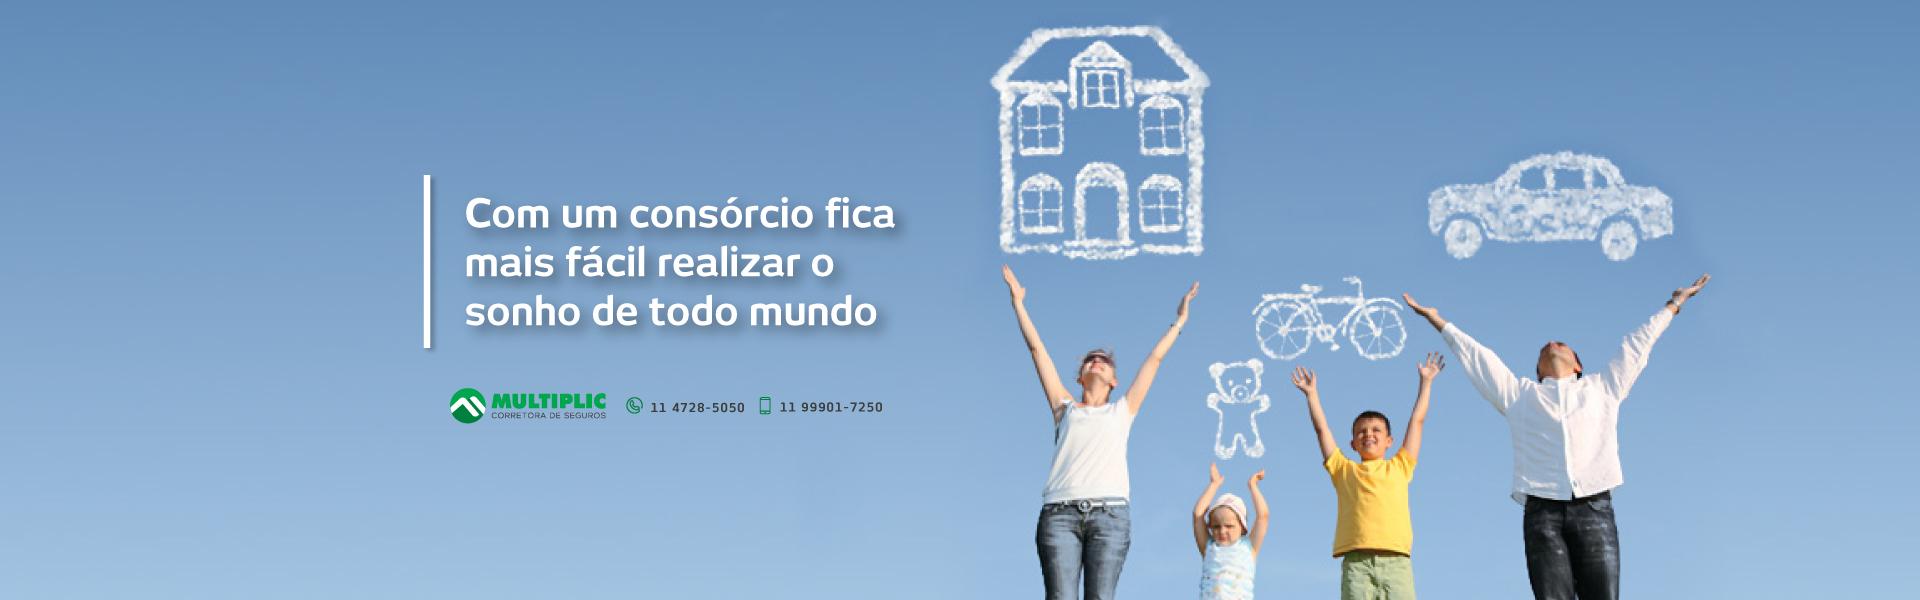 multiplic_banner_site_consorcio_menor